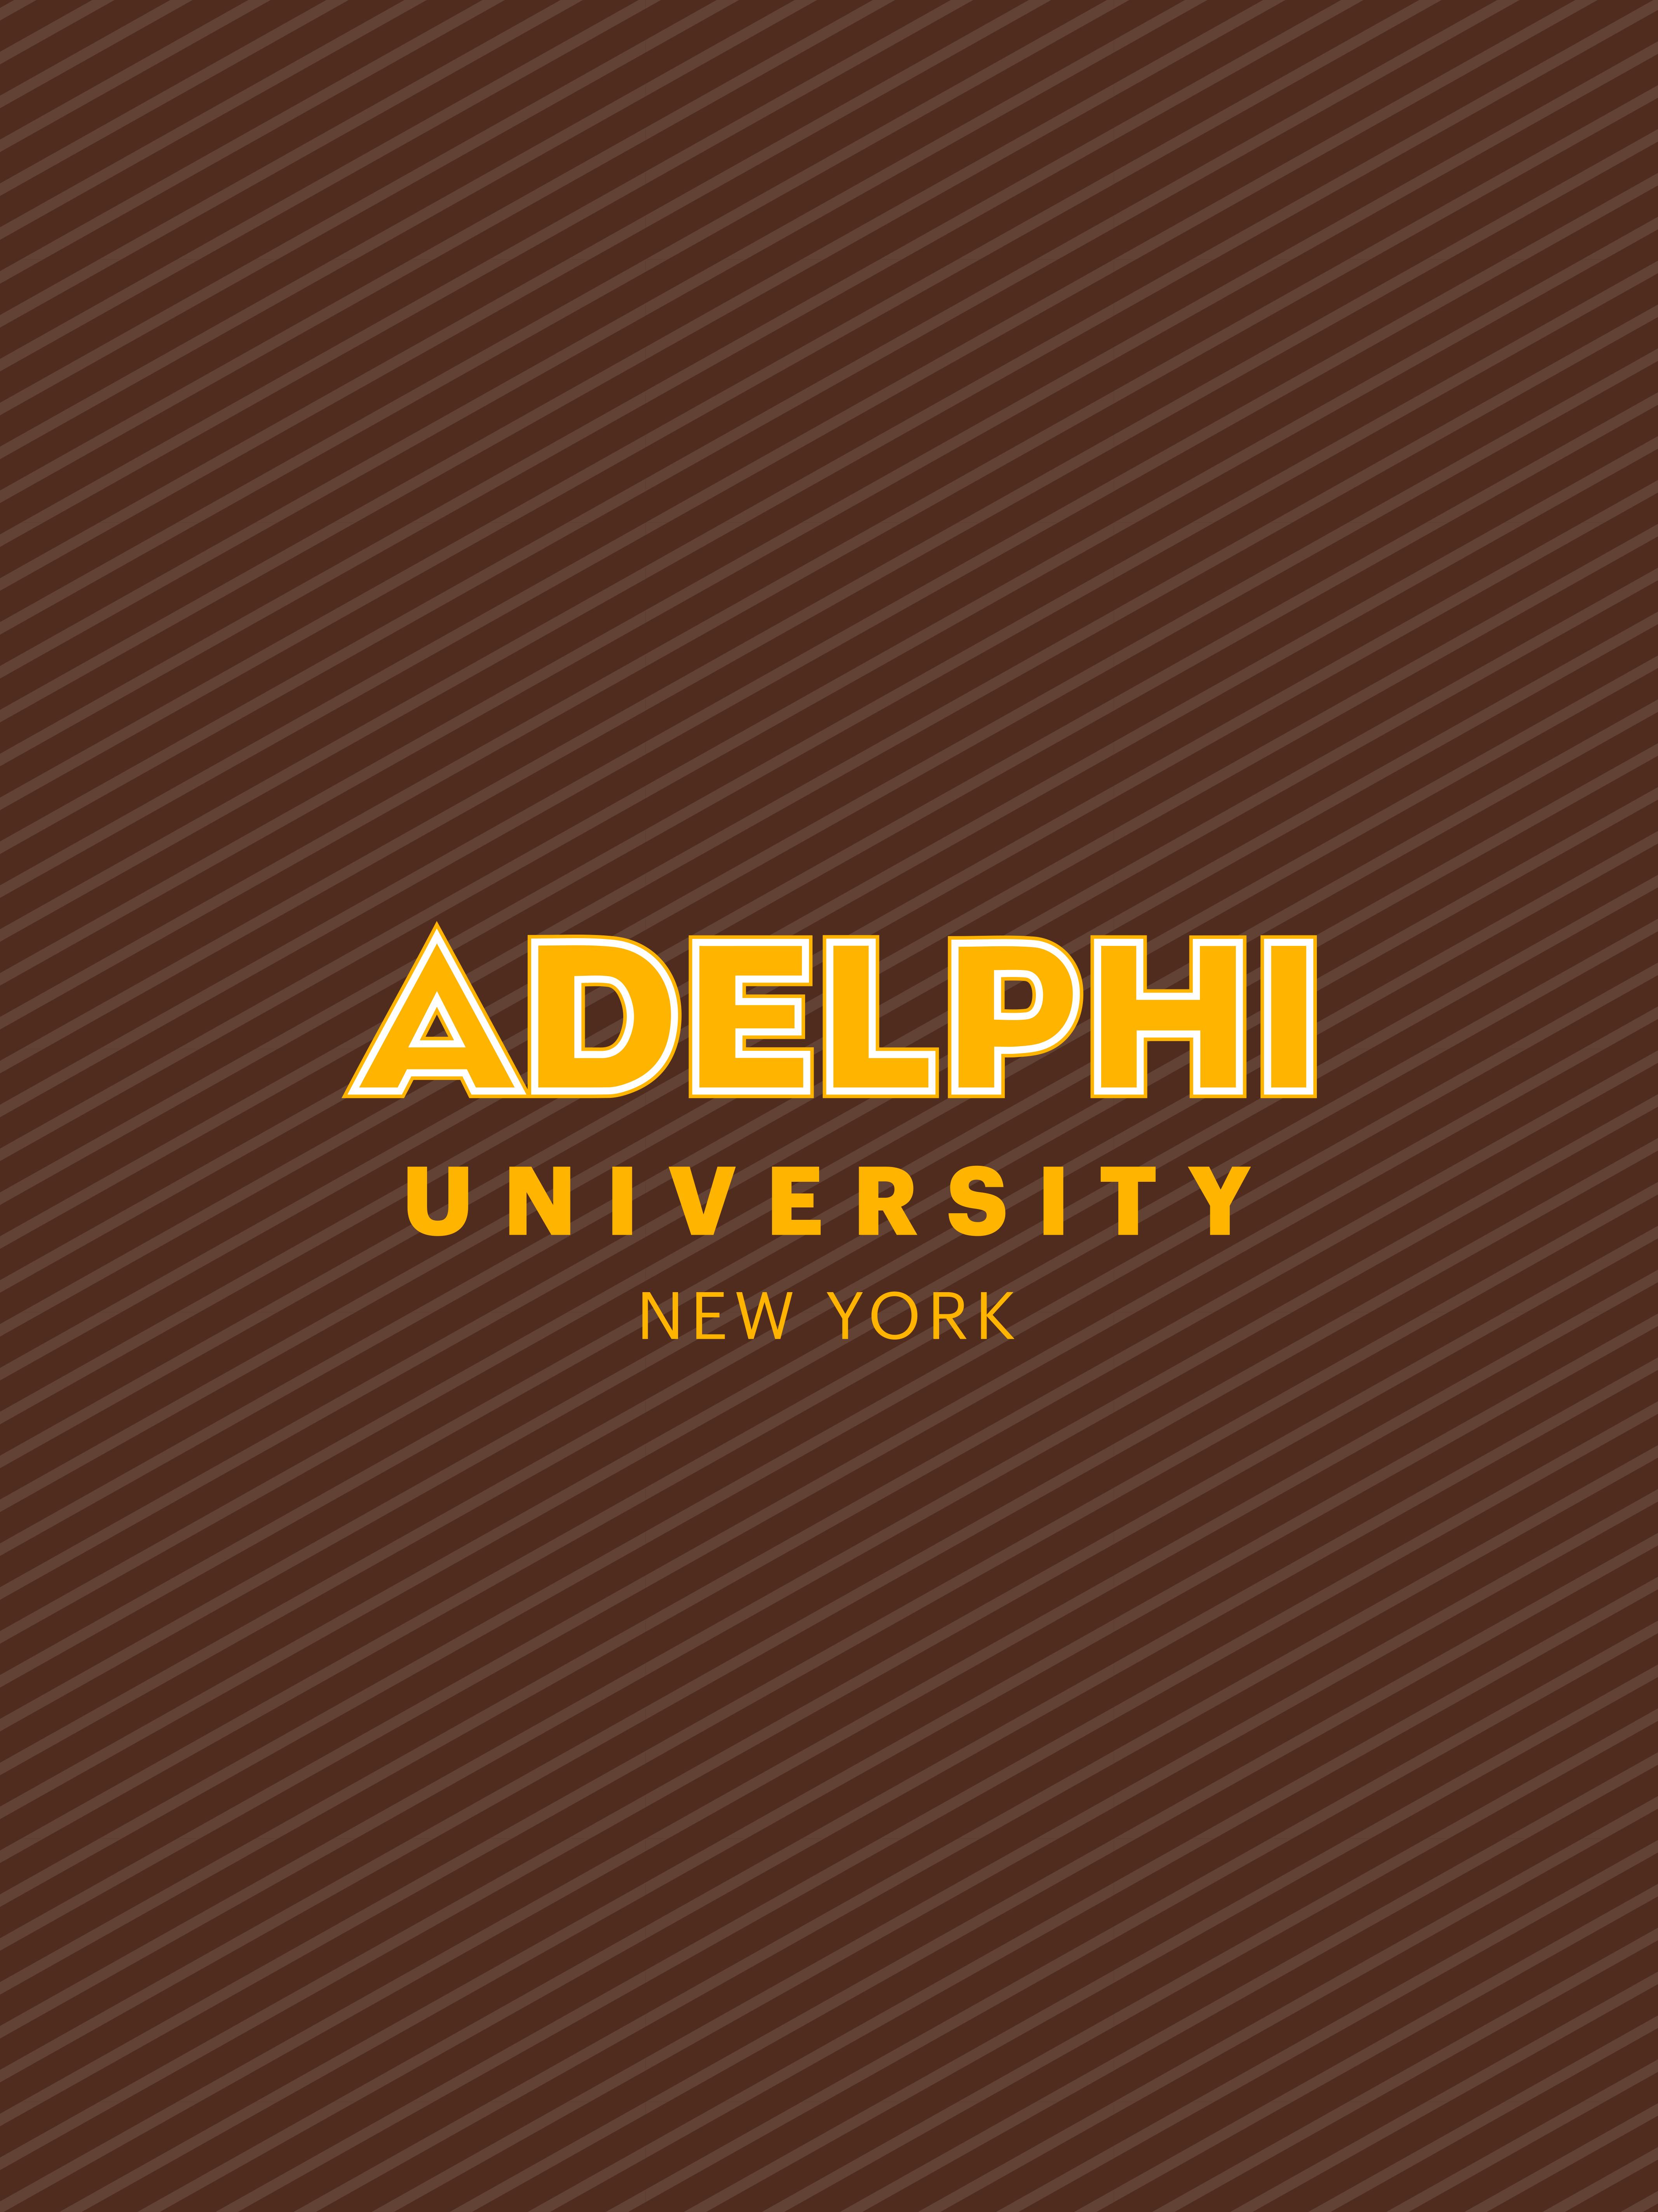 Tablet - Adelphi Brown Wallpaper